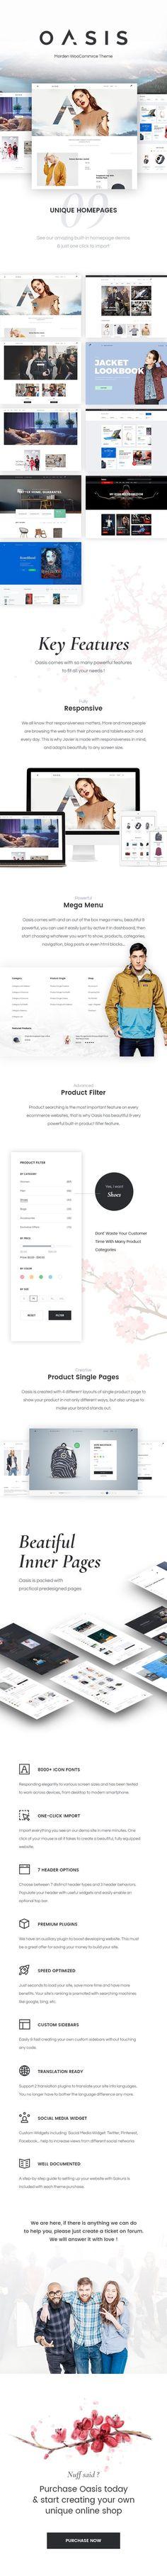 Oasis - Modern WooCommerce Theme #wordpress #shop #professional • Download theme ➝ https://themeforest.net/item/oasis-modern-woocommerce-theme/18401438?ref=rabosch